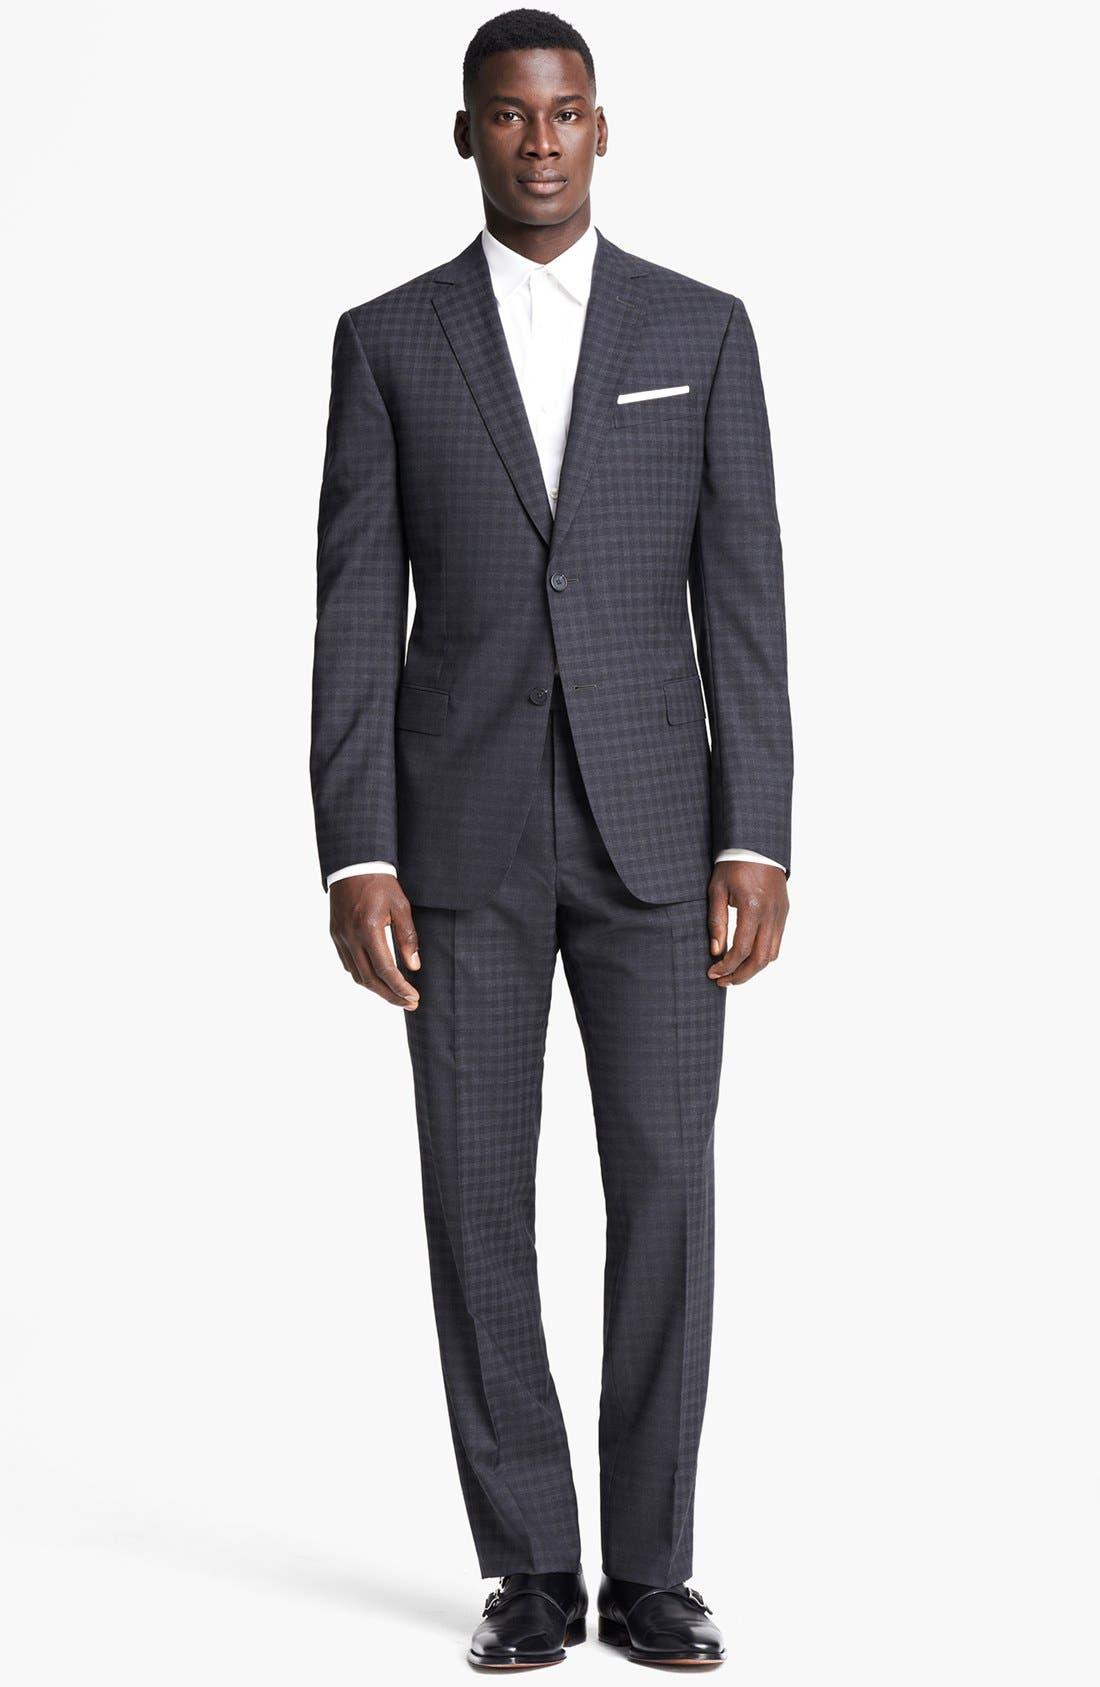 Alternate Image 1 Selected - Z Zegna 'City' Dark Grey Check Wool Suit